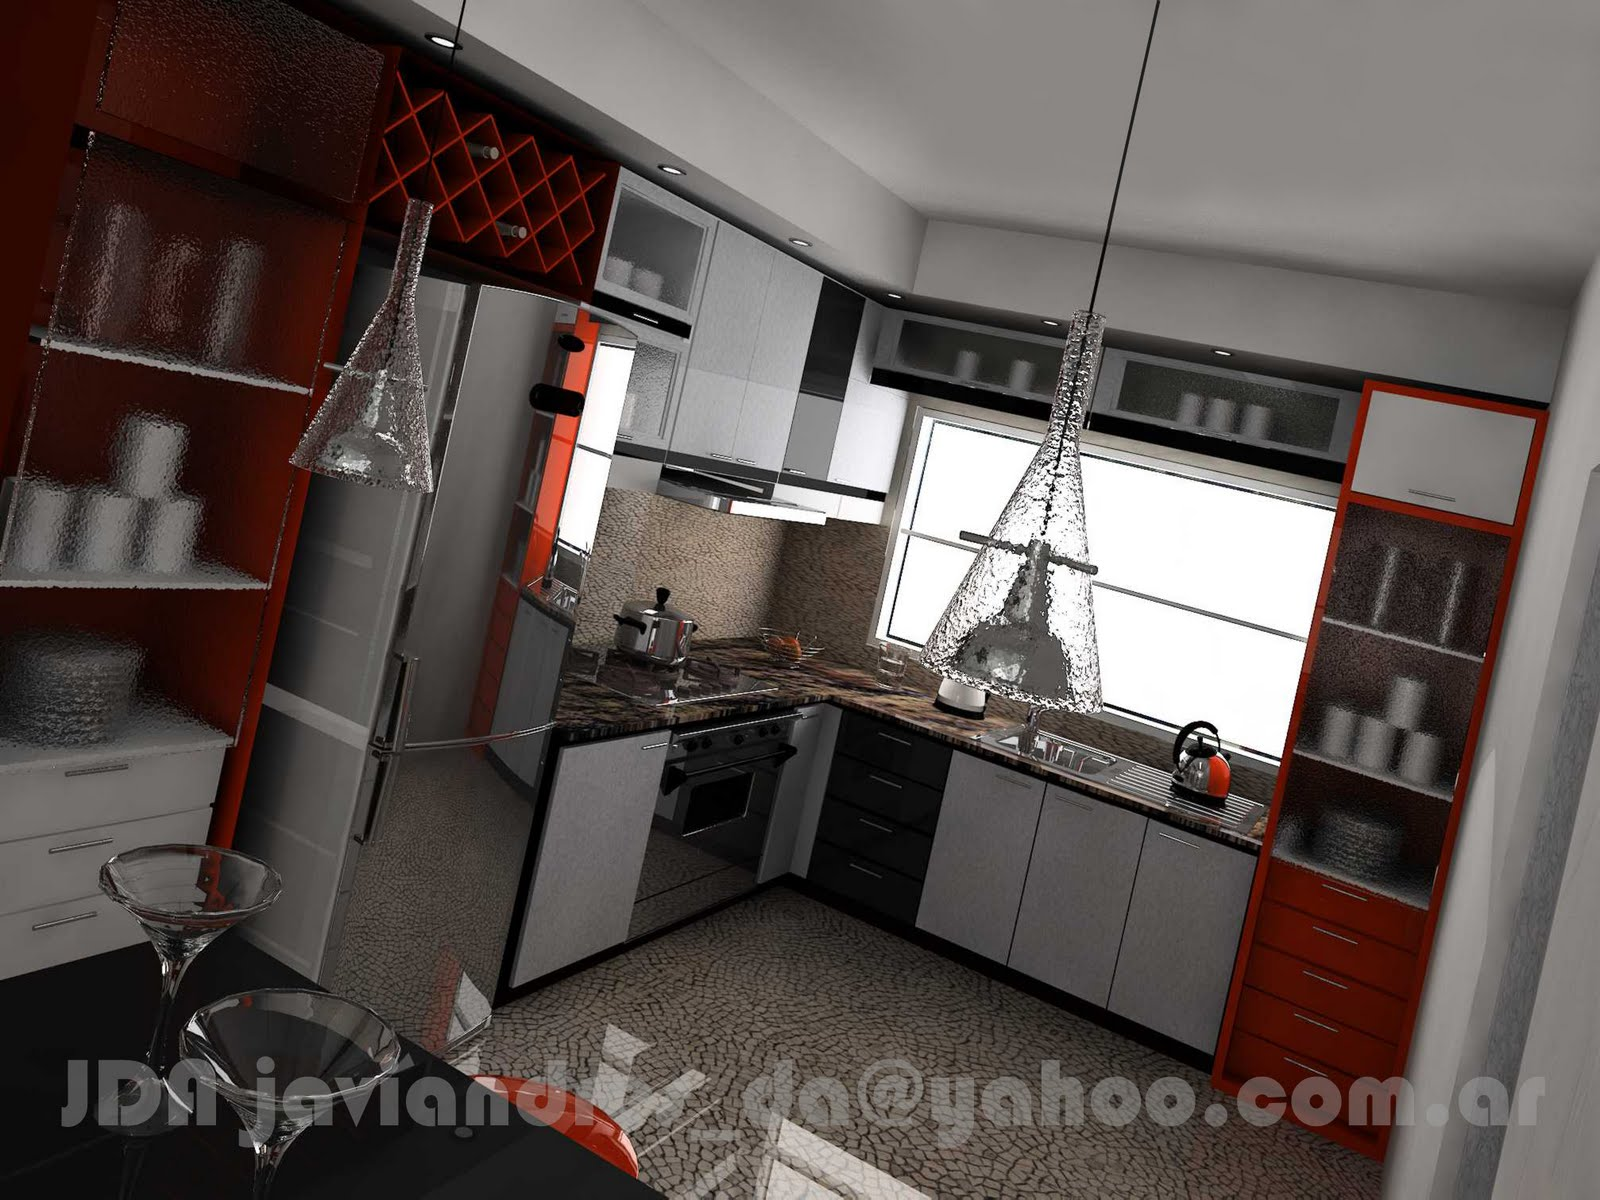 Stands 90s2000 free lance cocina 3d en departamento for Cocina departamento